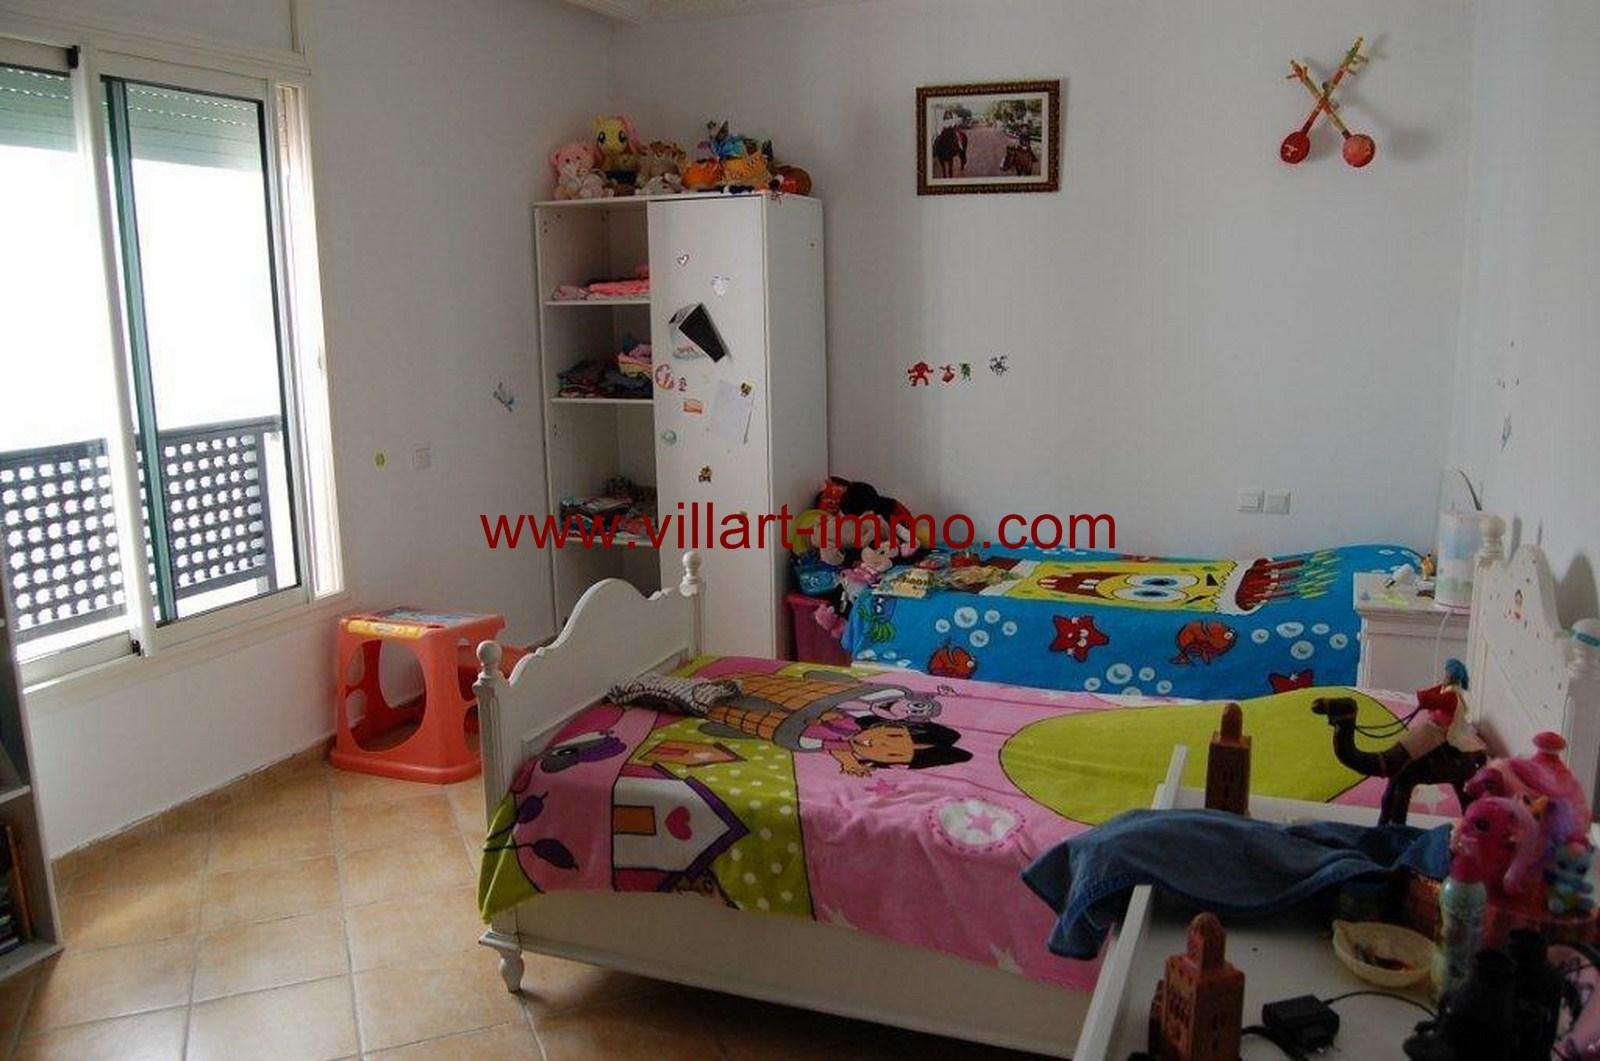 6-location-villa-meuble-malabata-tanger-chambre-3-lv884-villart-immo